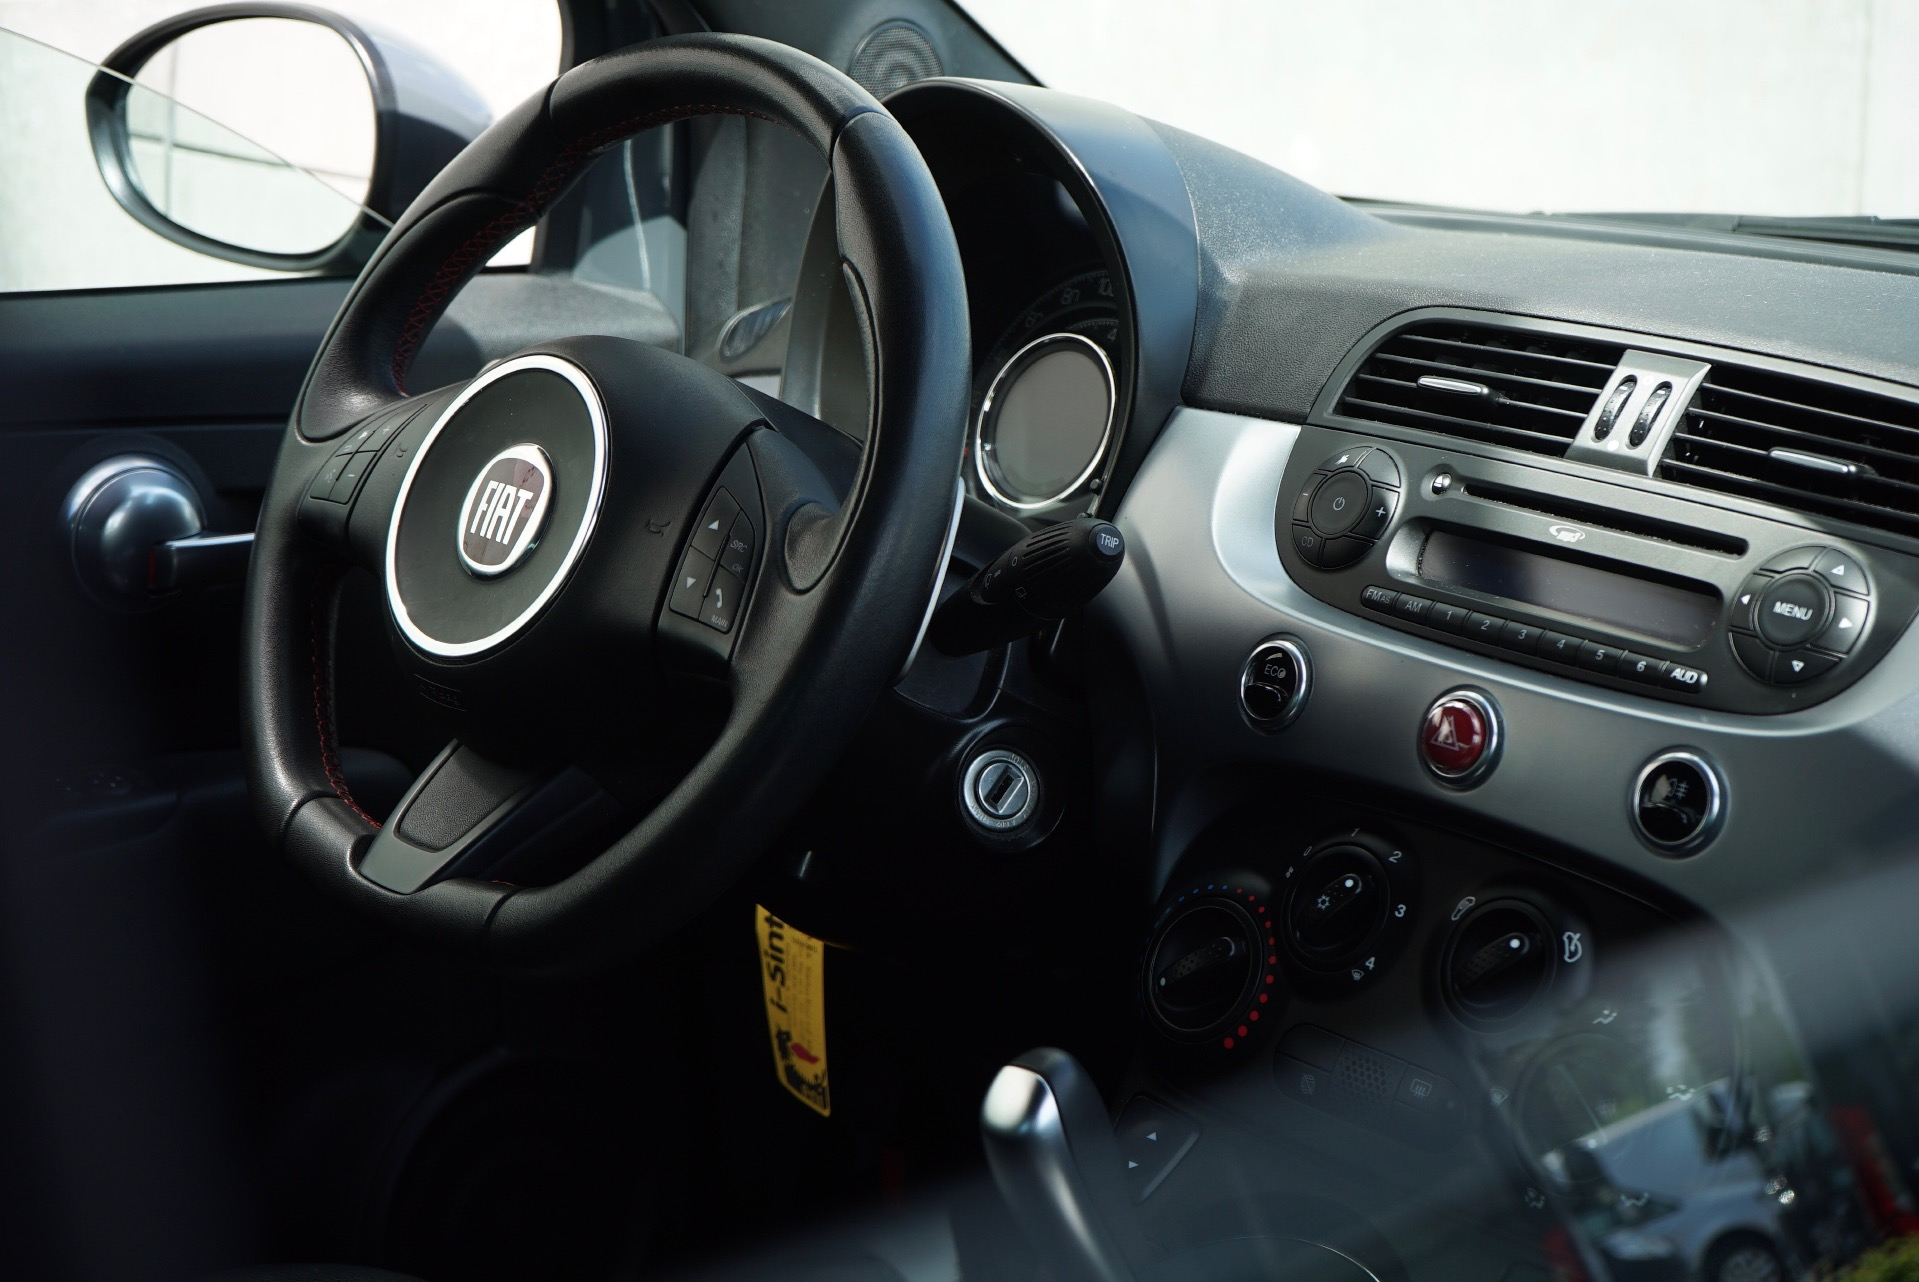 FIAT 500 TWINAIR TURBO SPORT DUALOGIC